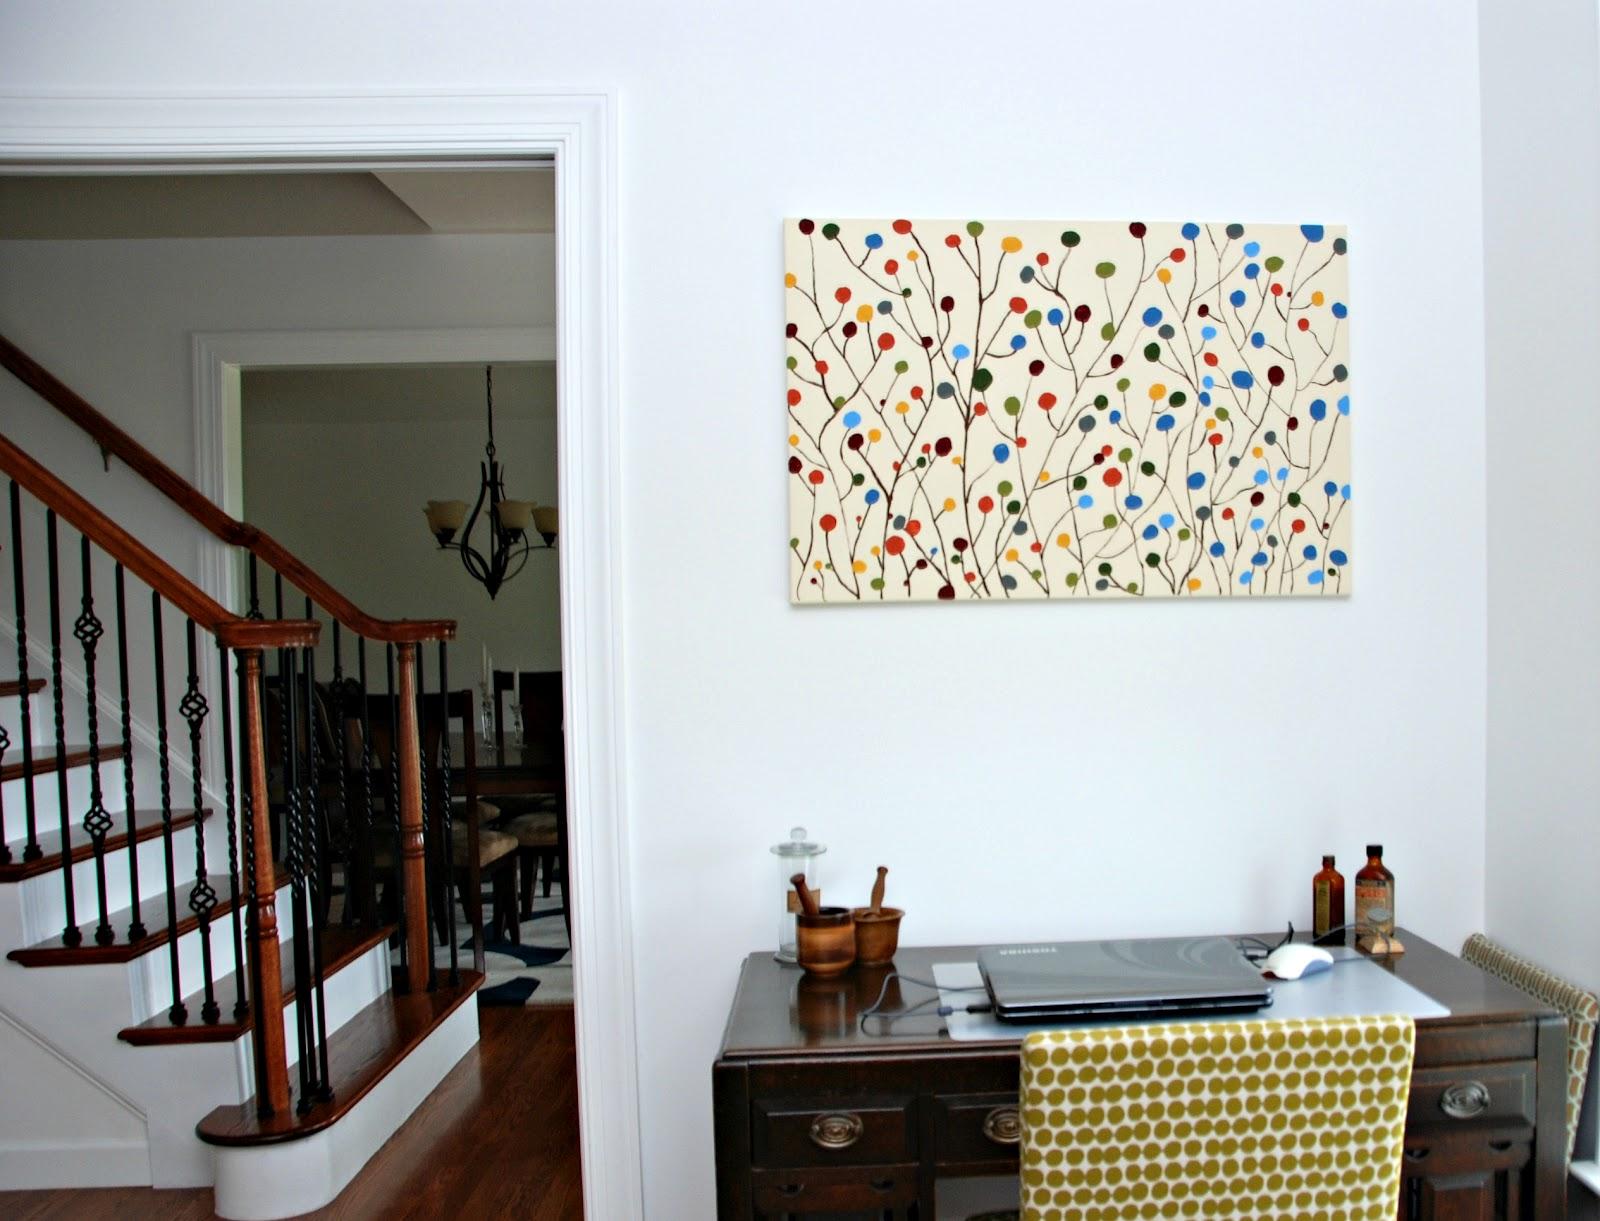 Unique Diy Wall Decor: One Creative Housewife: DIY Contemporary Wall Art